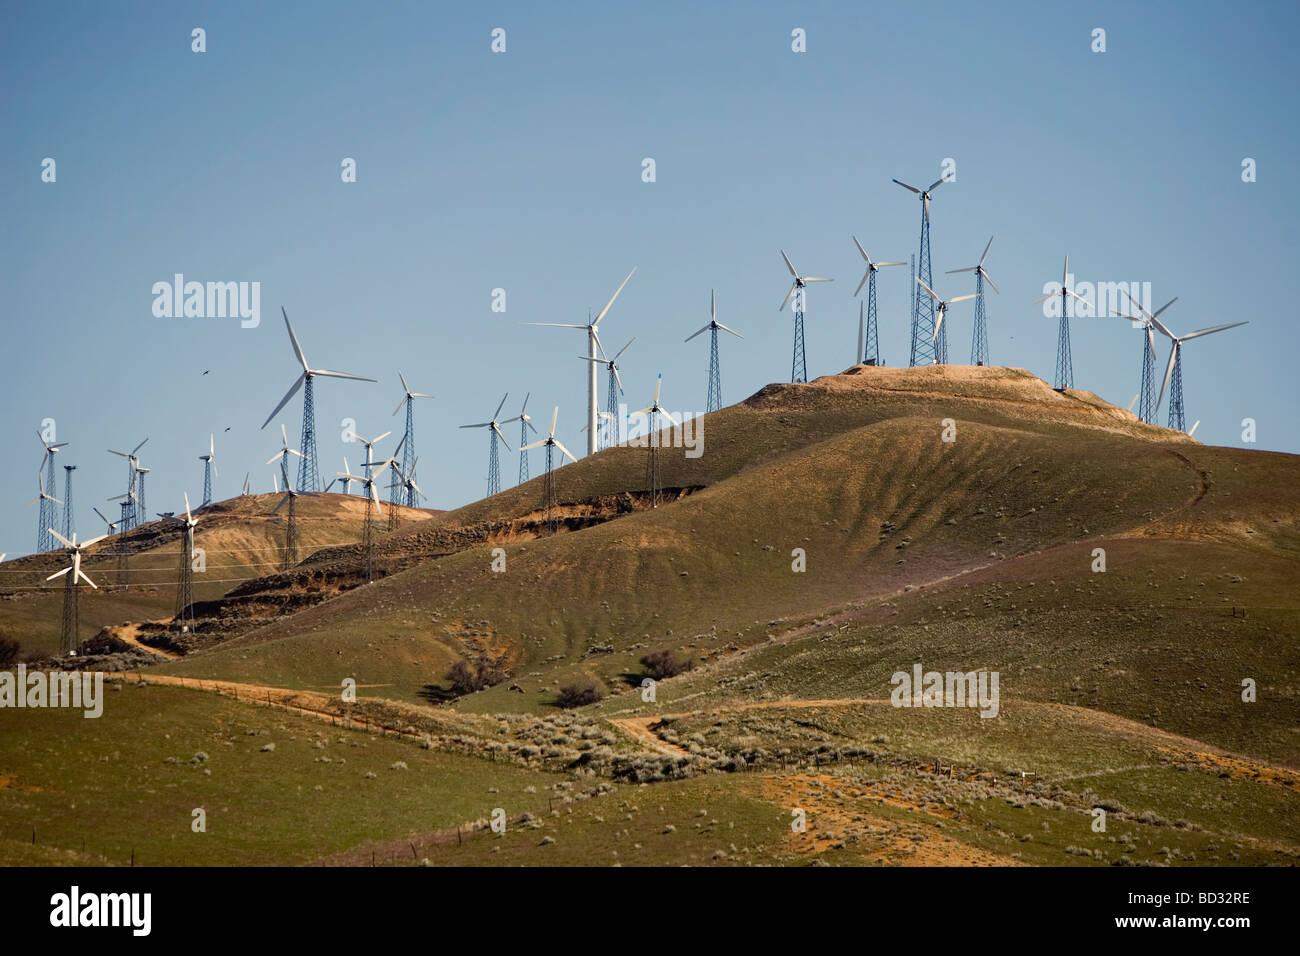 Wind turbines generating electricity Stock Photo